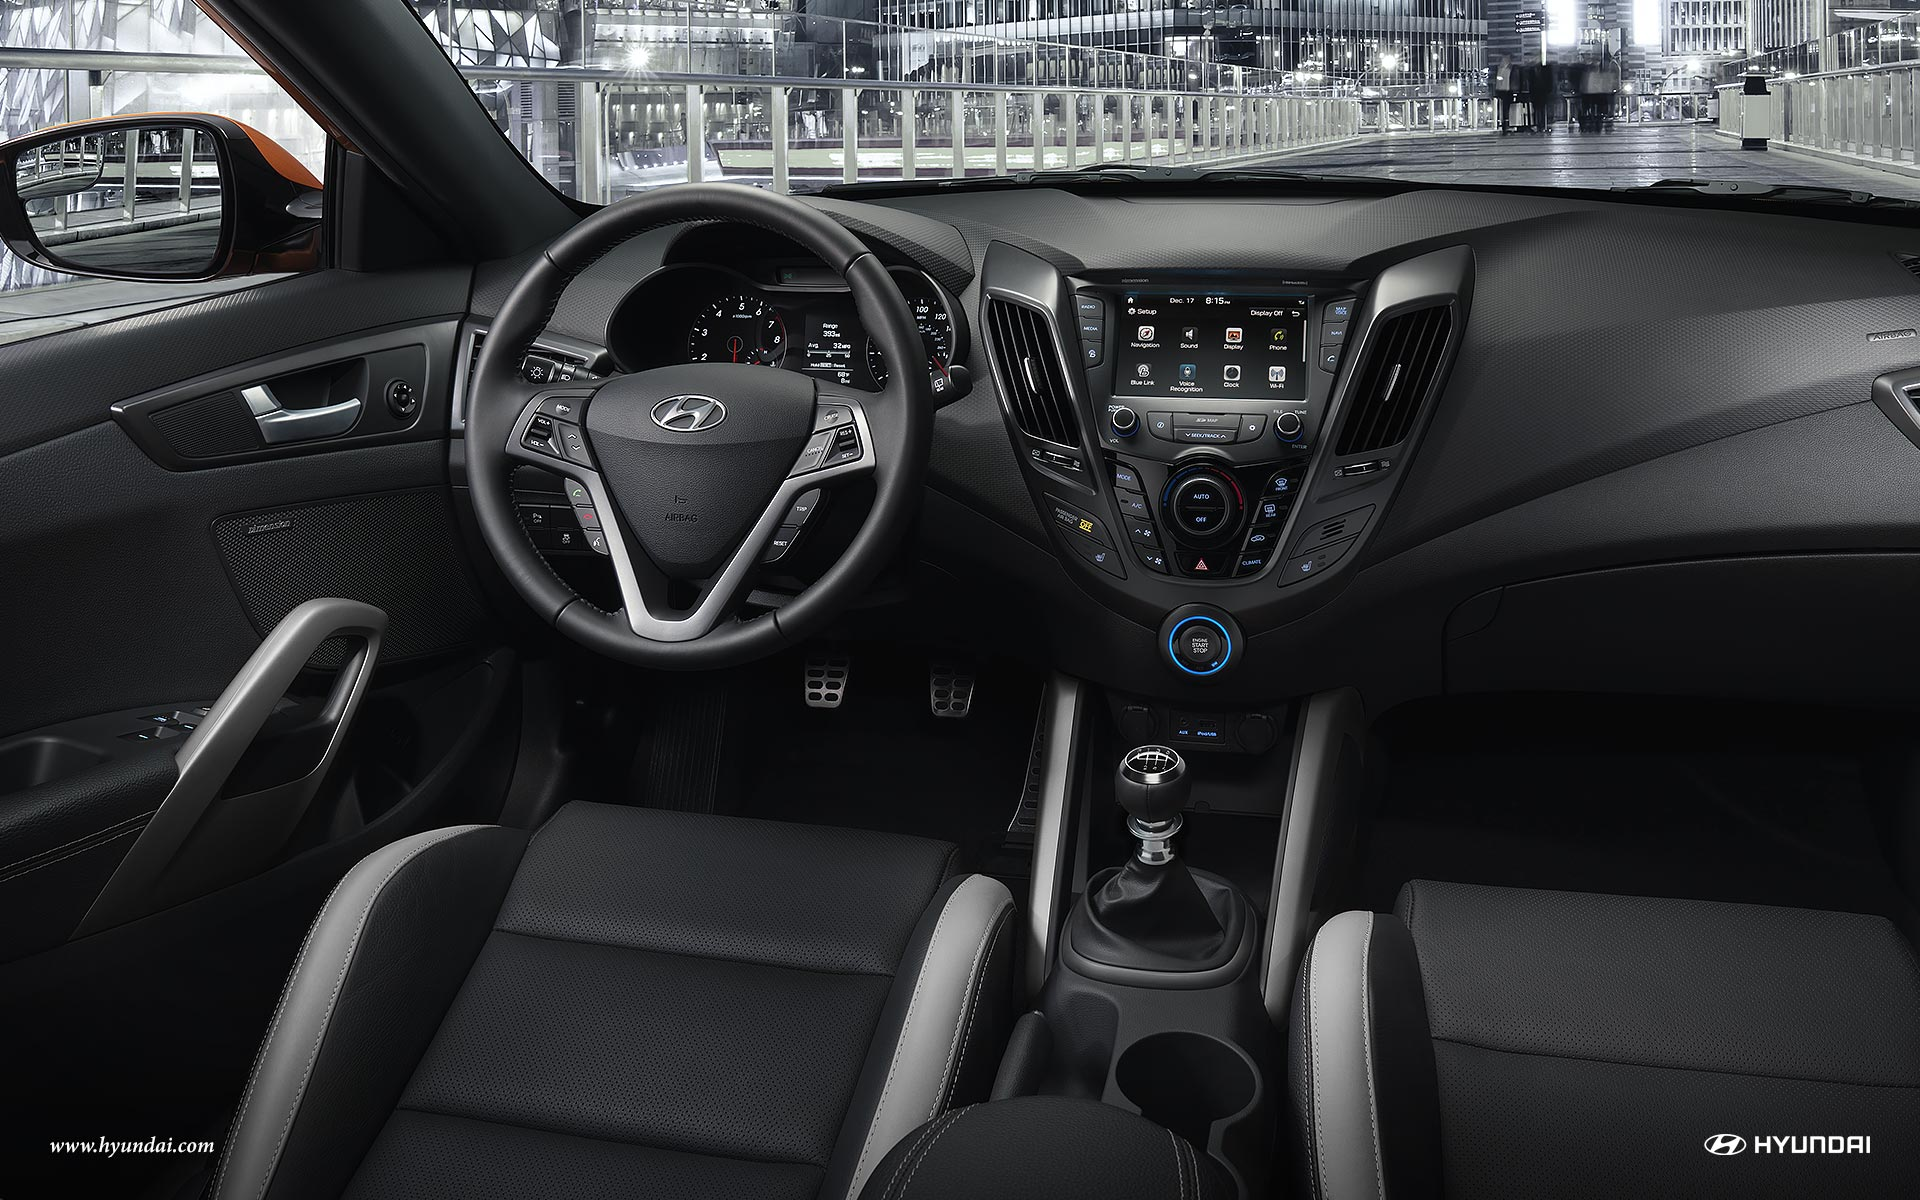 2017 Hyundai Veloster Interior Dashboard